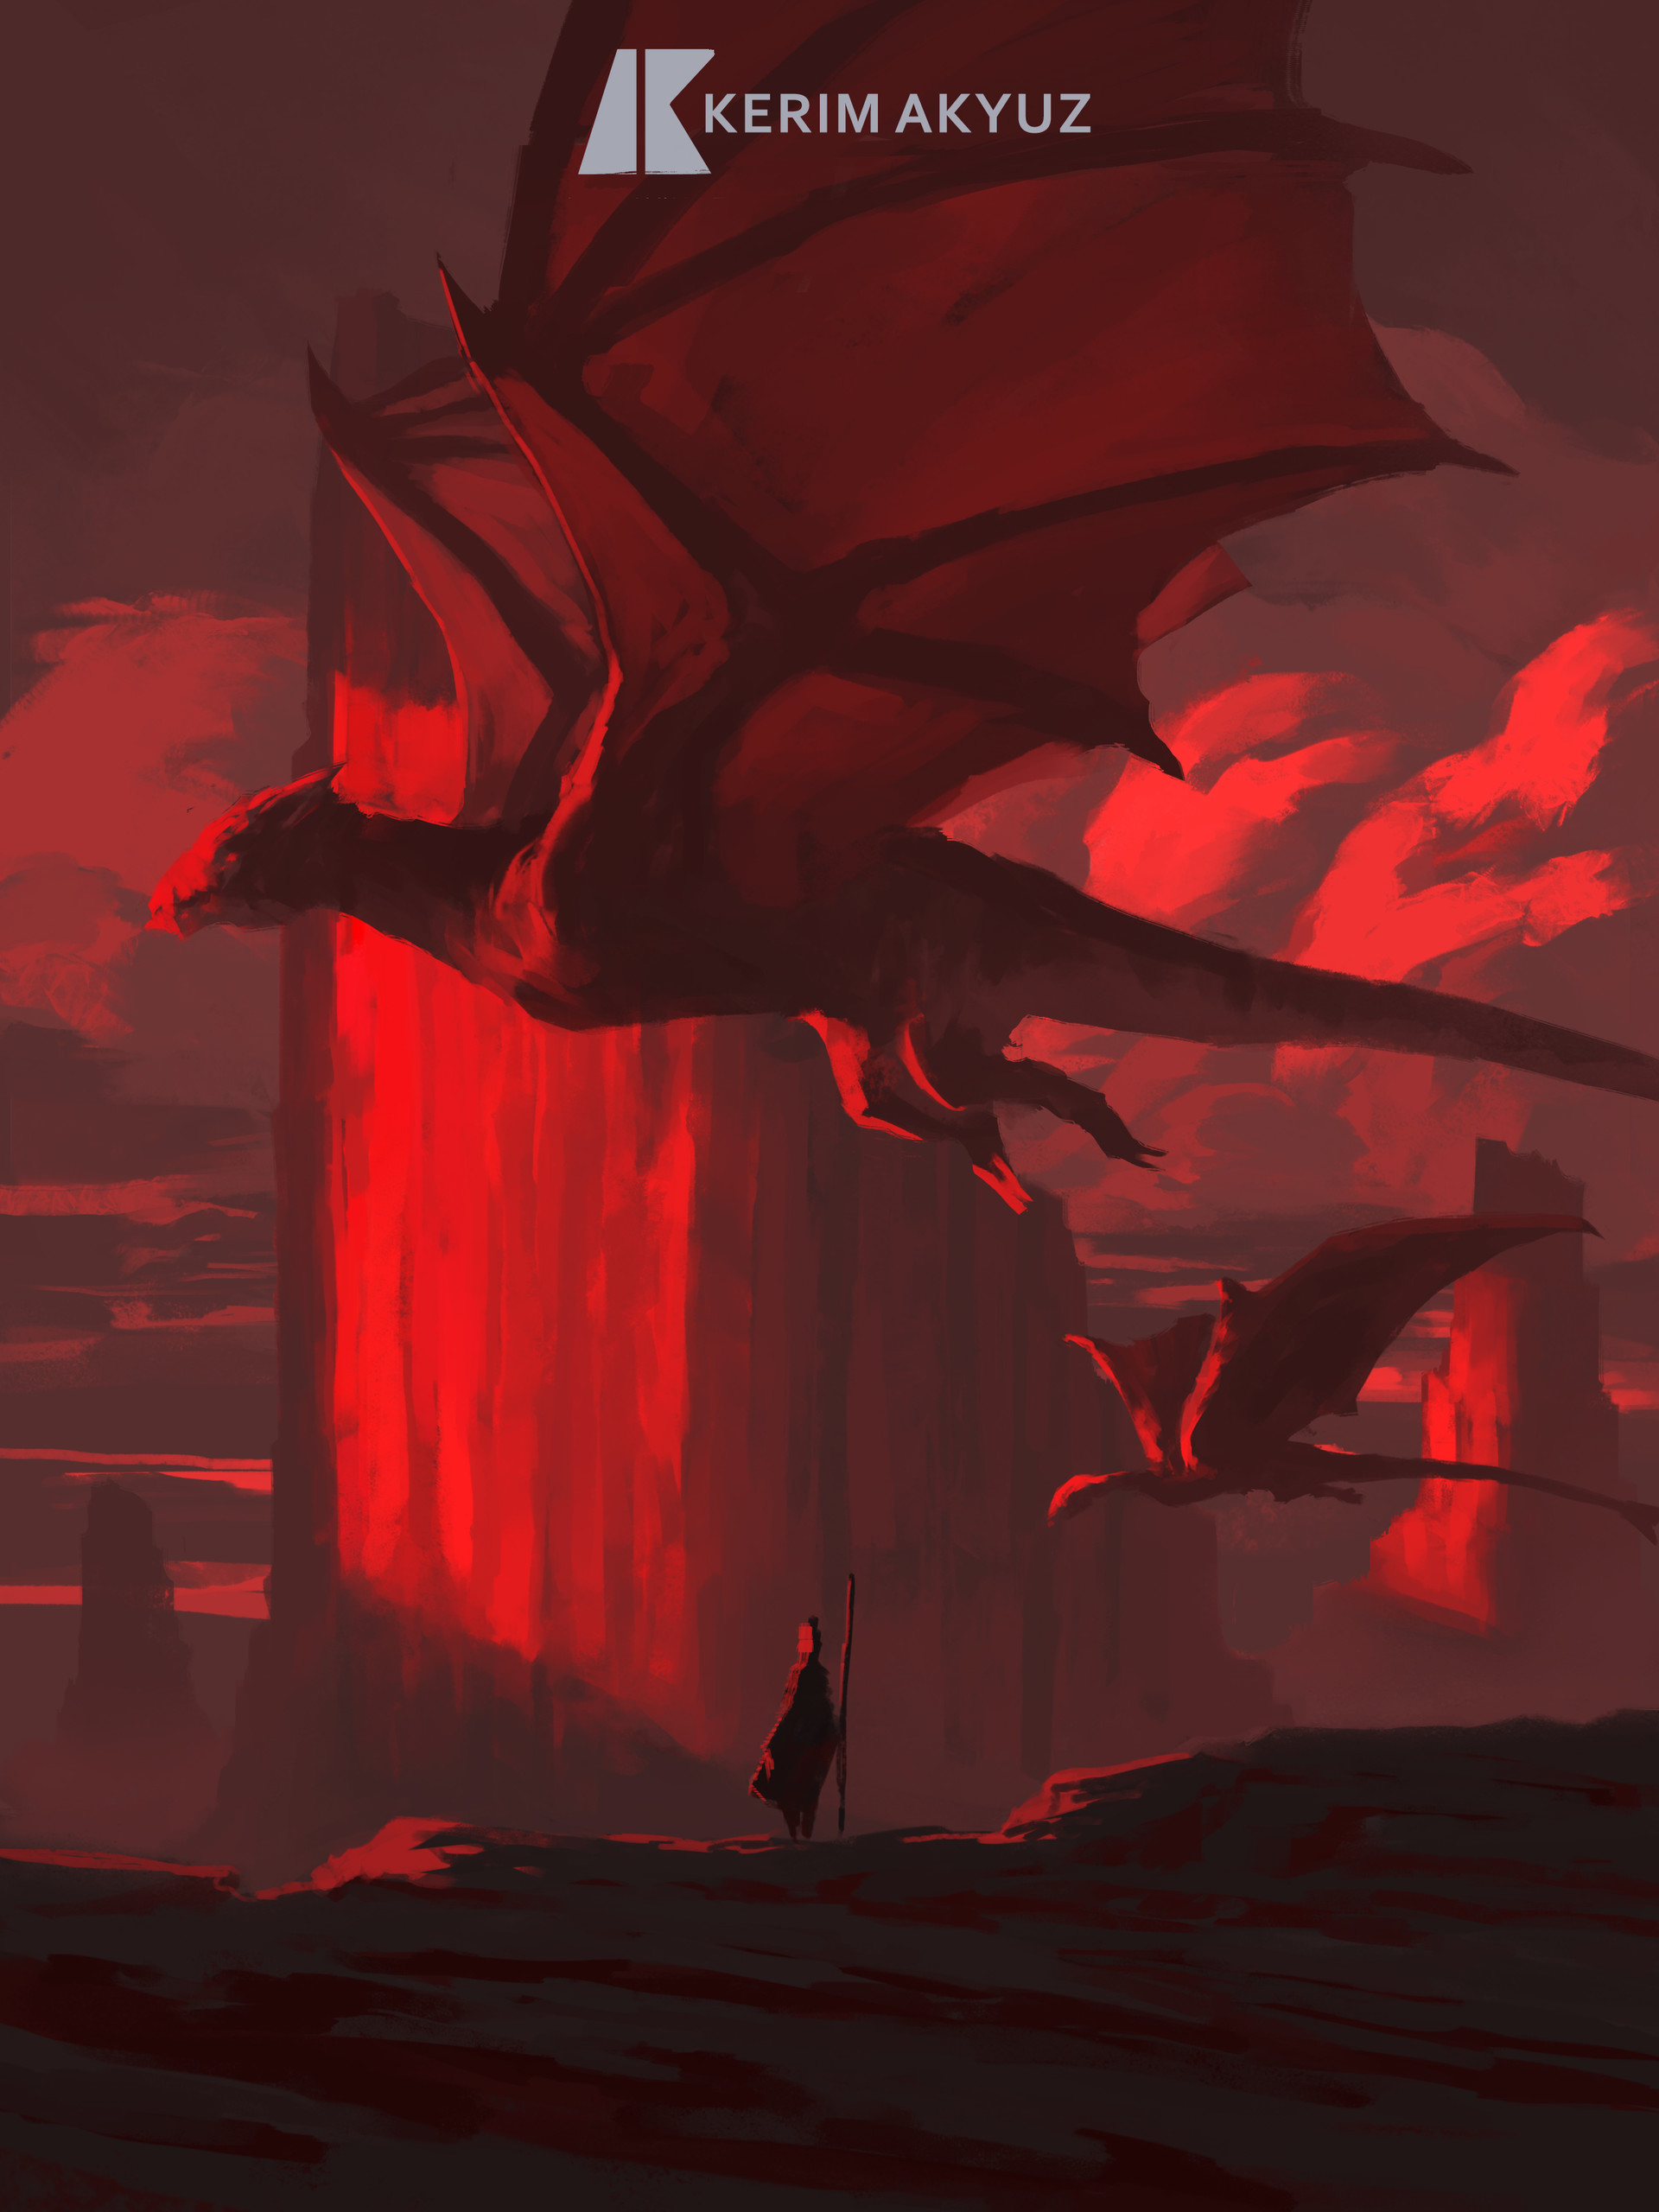 Kerim akyuz 152 dragonherder